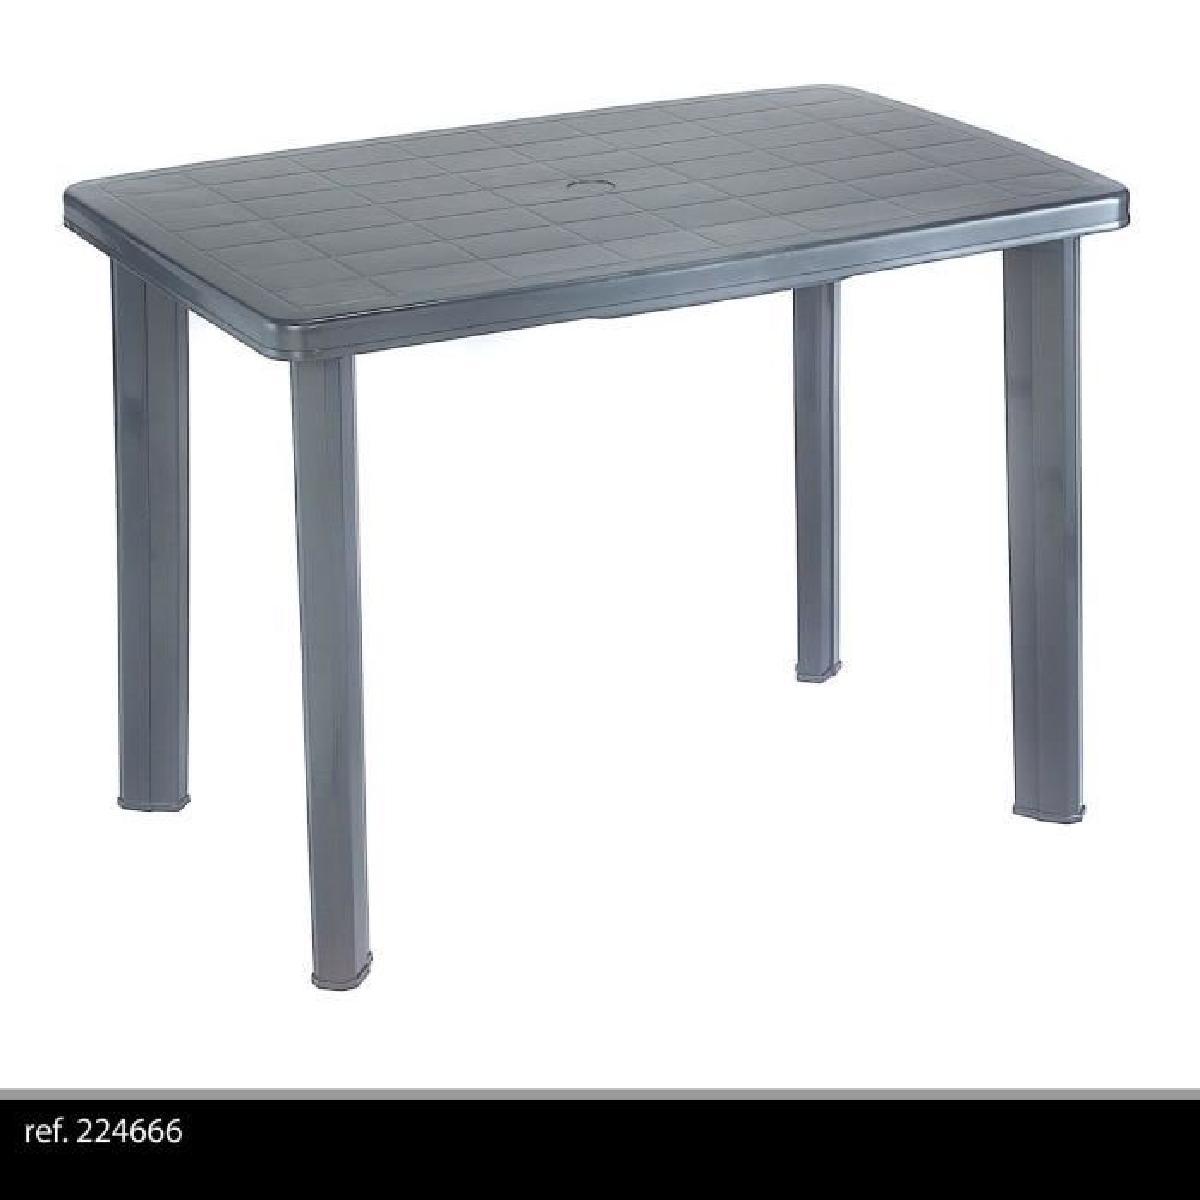 table de jardin demontable